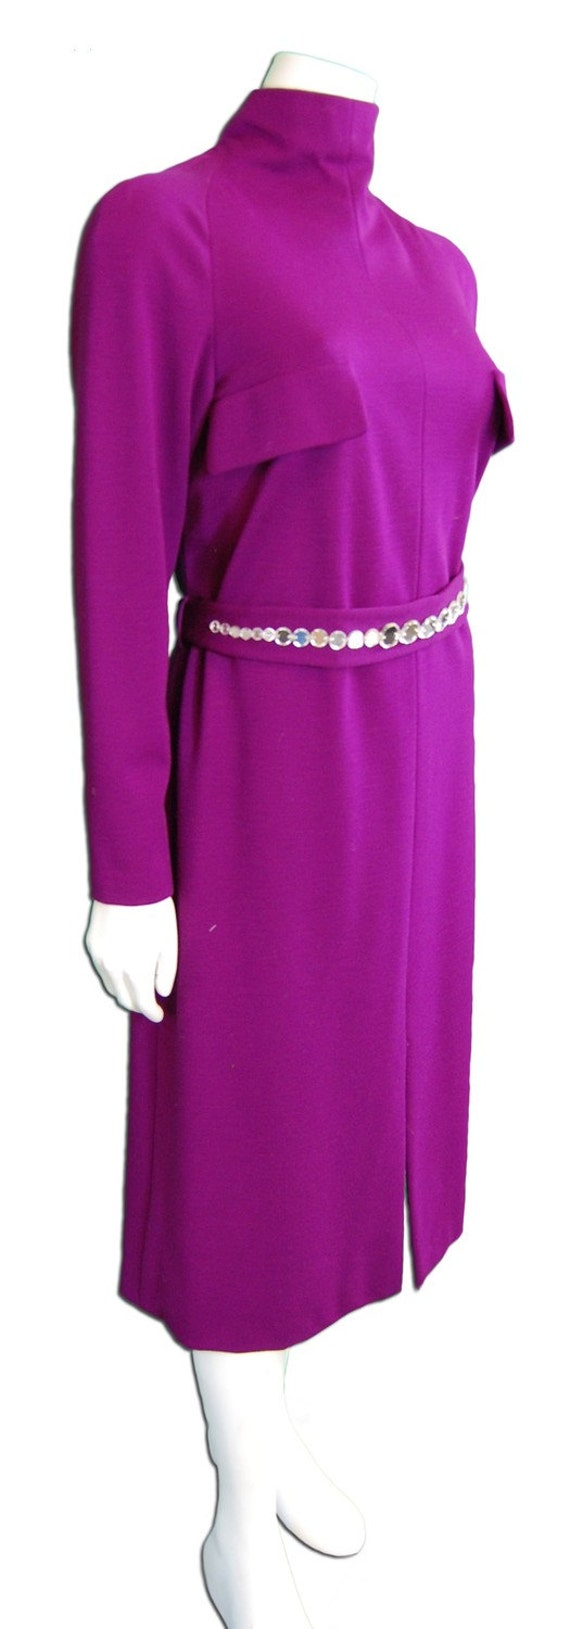 Pauline Trigere Plum Jersey Knit Dress - image 4